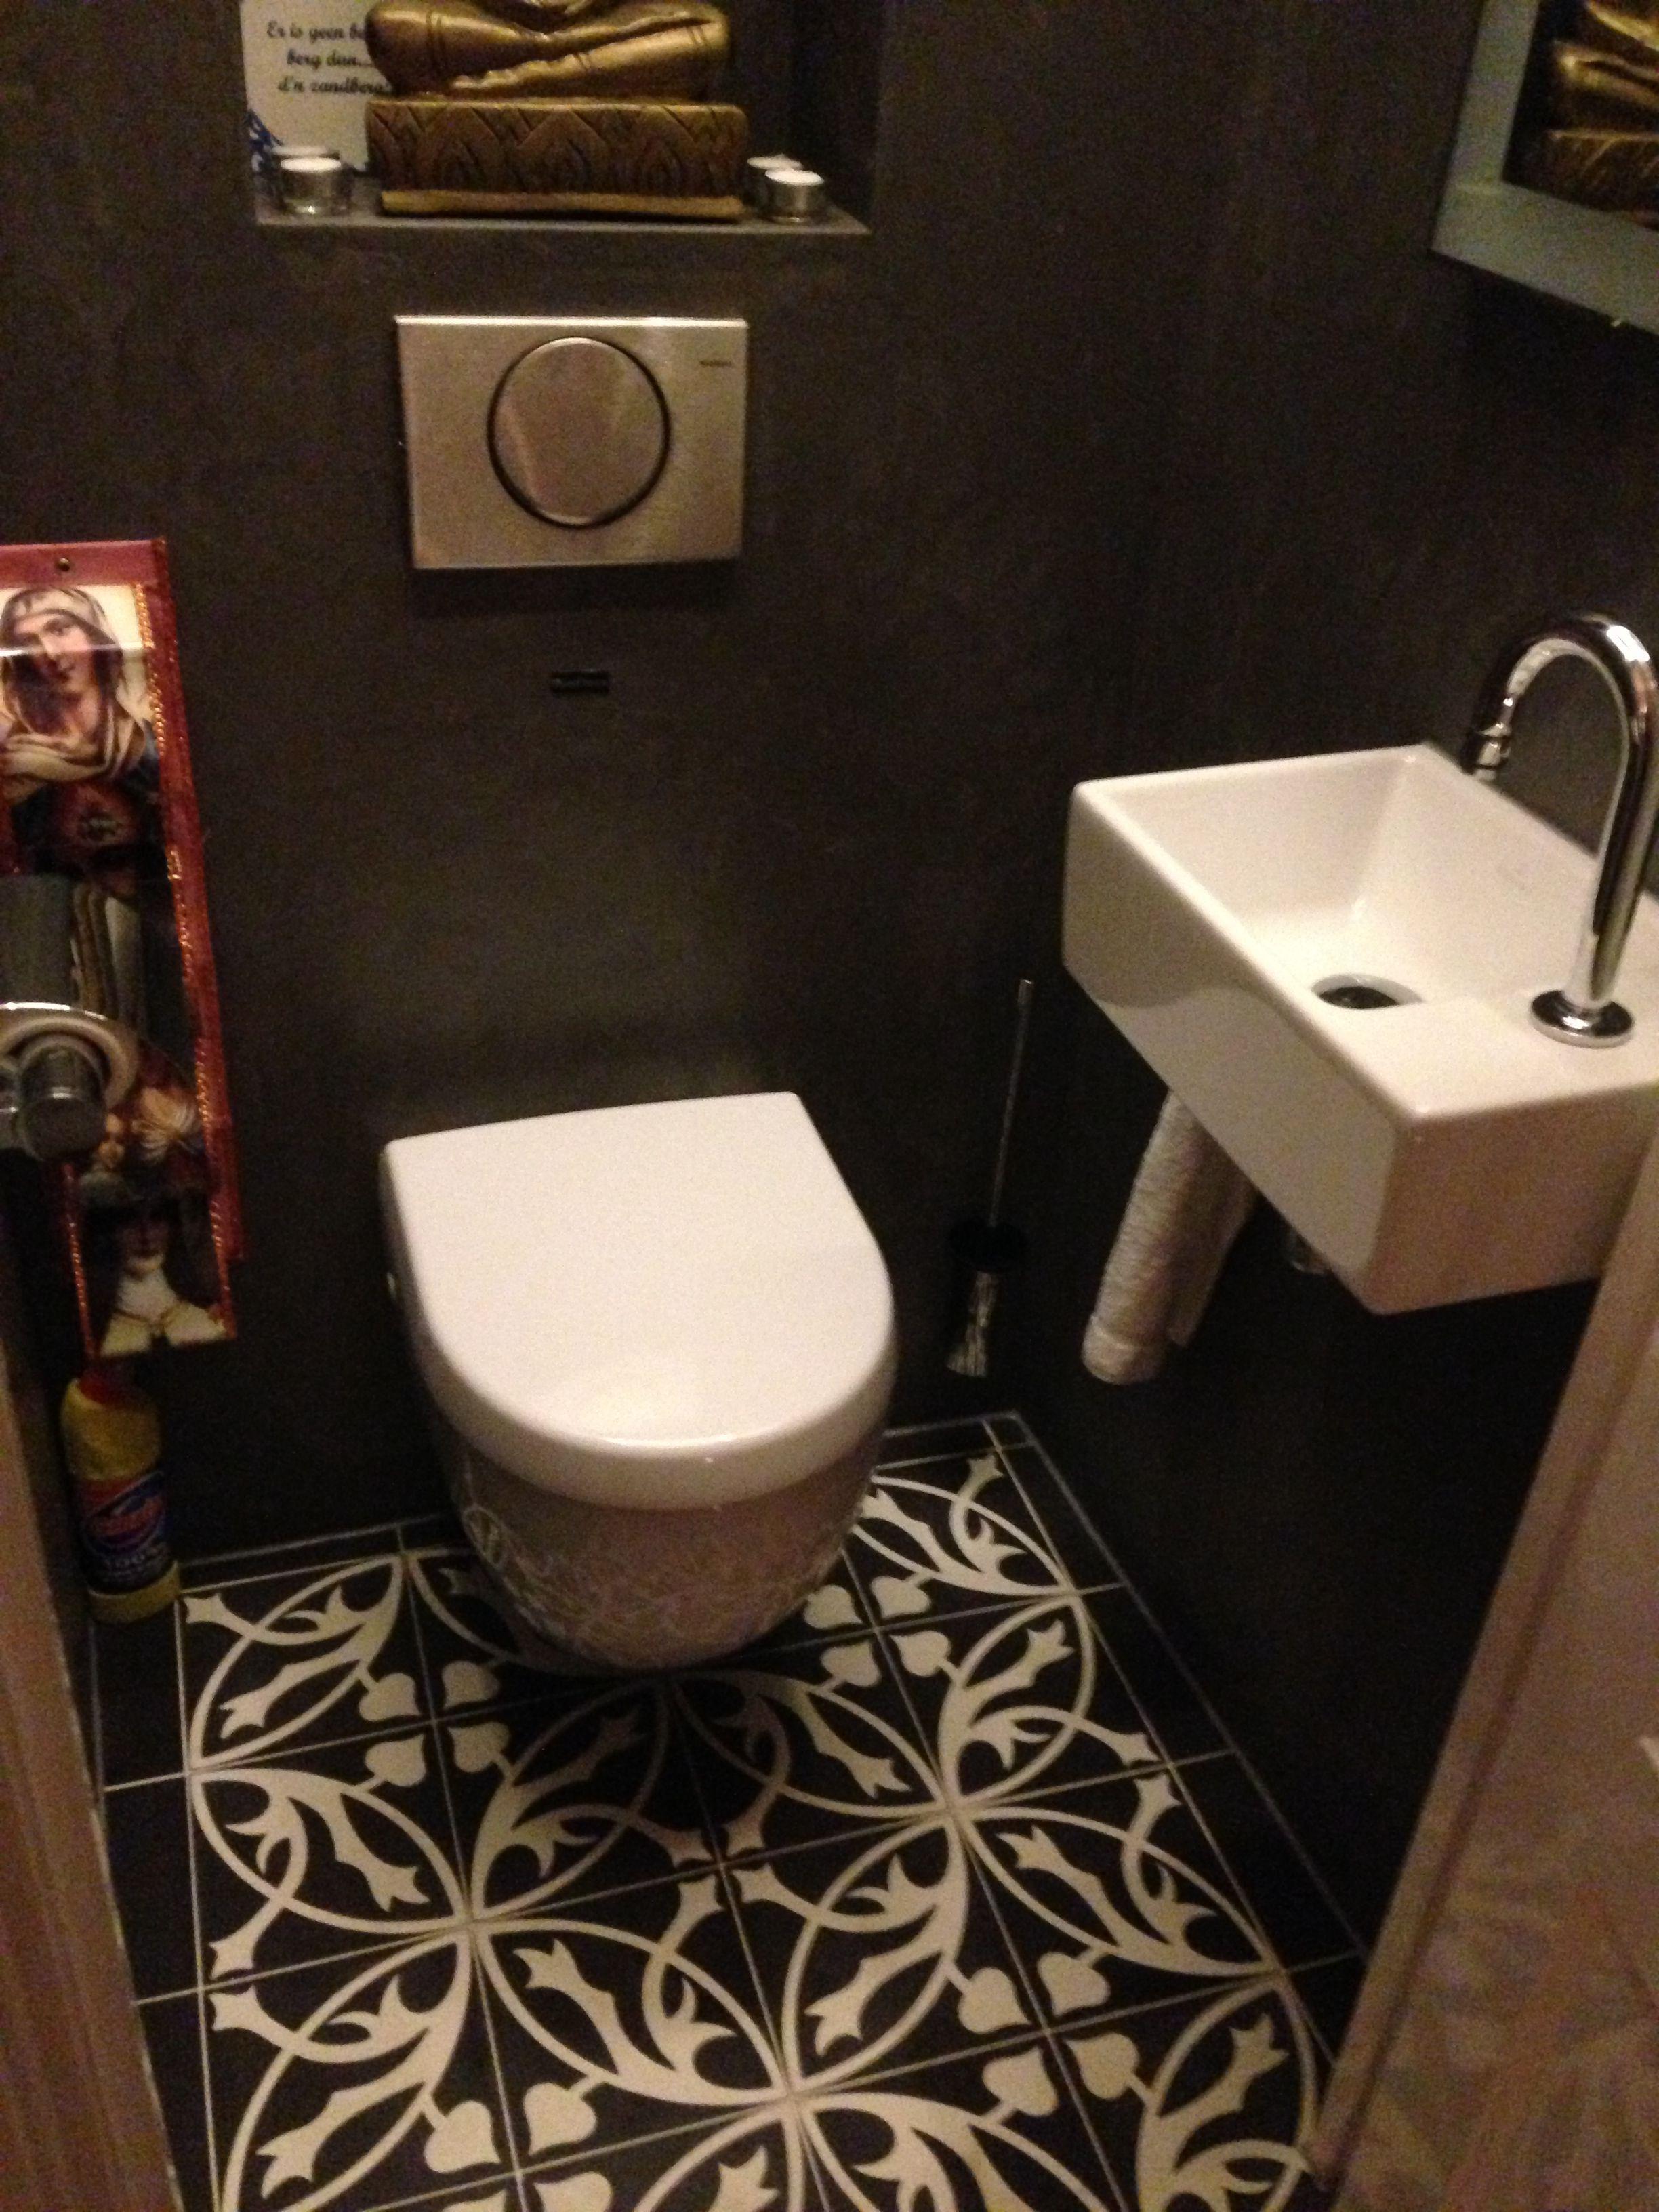 Spaanse castelo patroon tegels vloer toilet gerealiseerd door morefloors verbouwing jaren 30 - Wc tegel ...